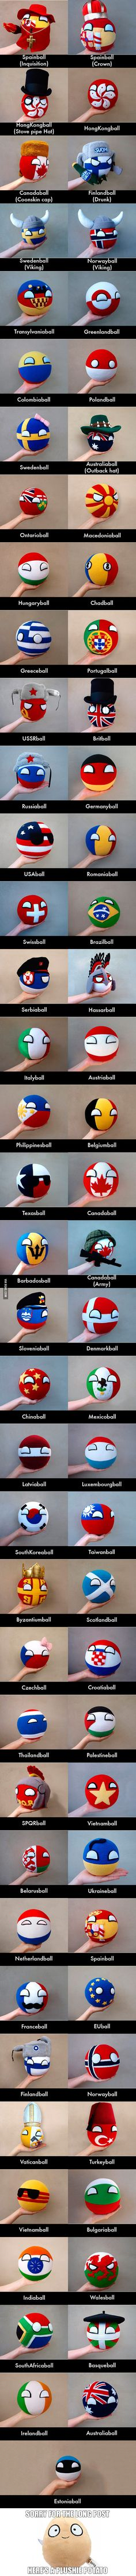 Meet the plushie countryballs. Credit: ThePlushieMagnate